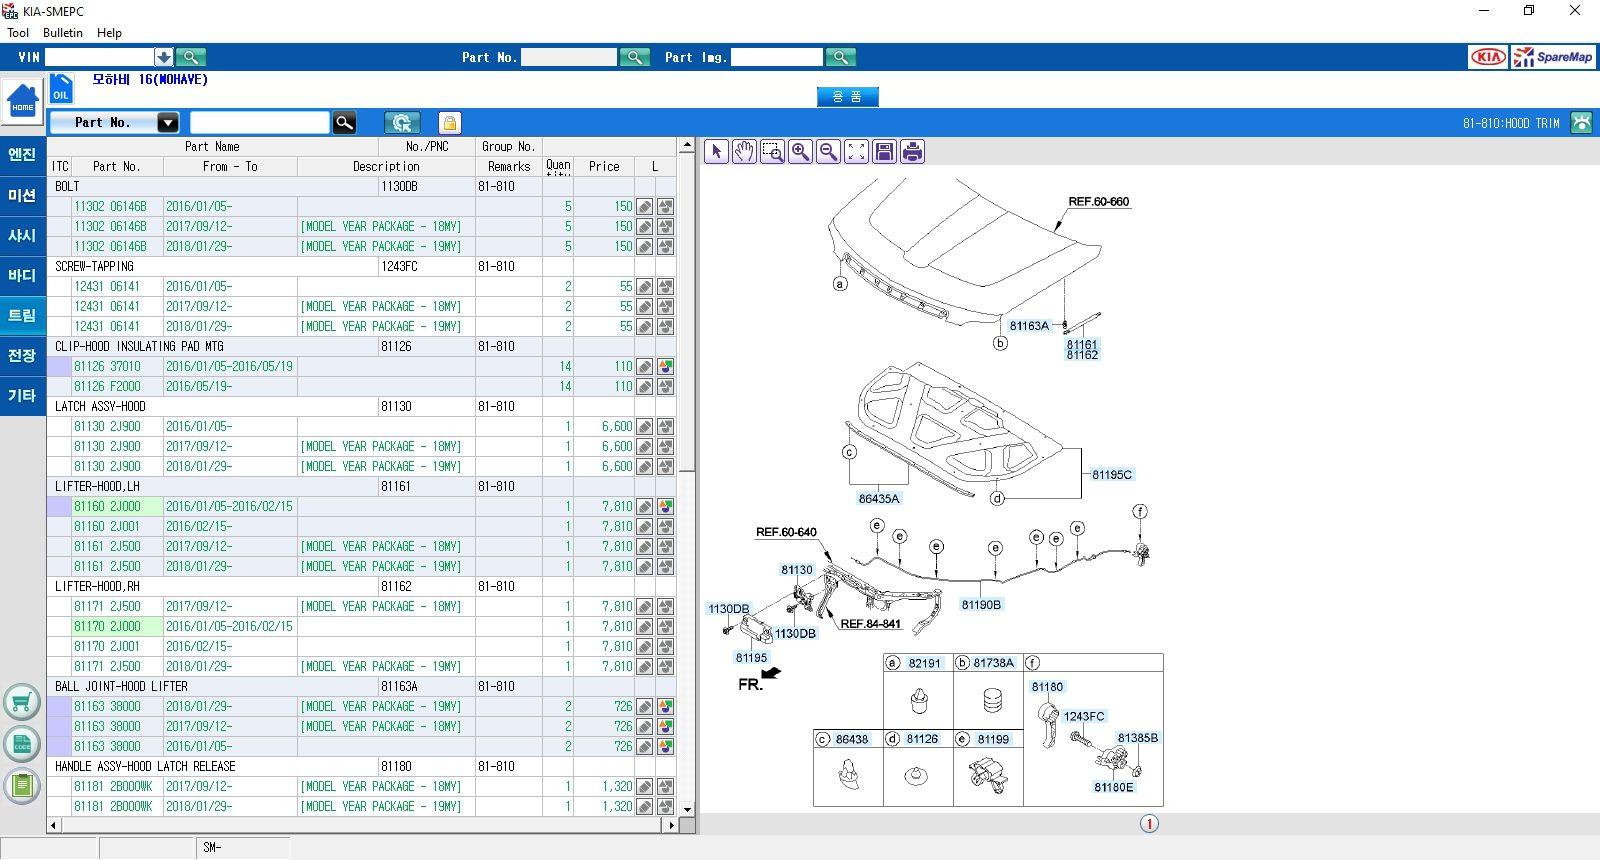 Hyundai_Kia_Korea_SM_EPC_072019_Parts_Catalog_Domestic_Market_5